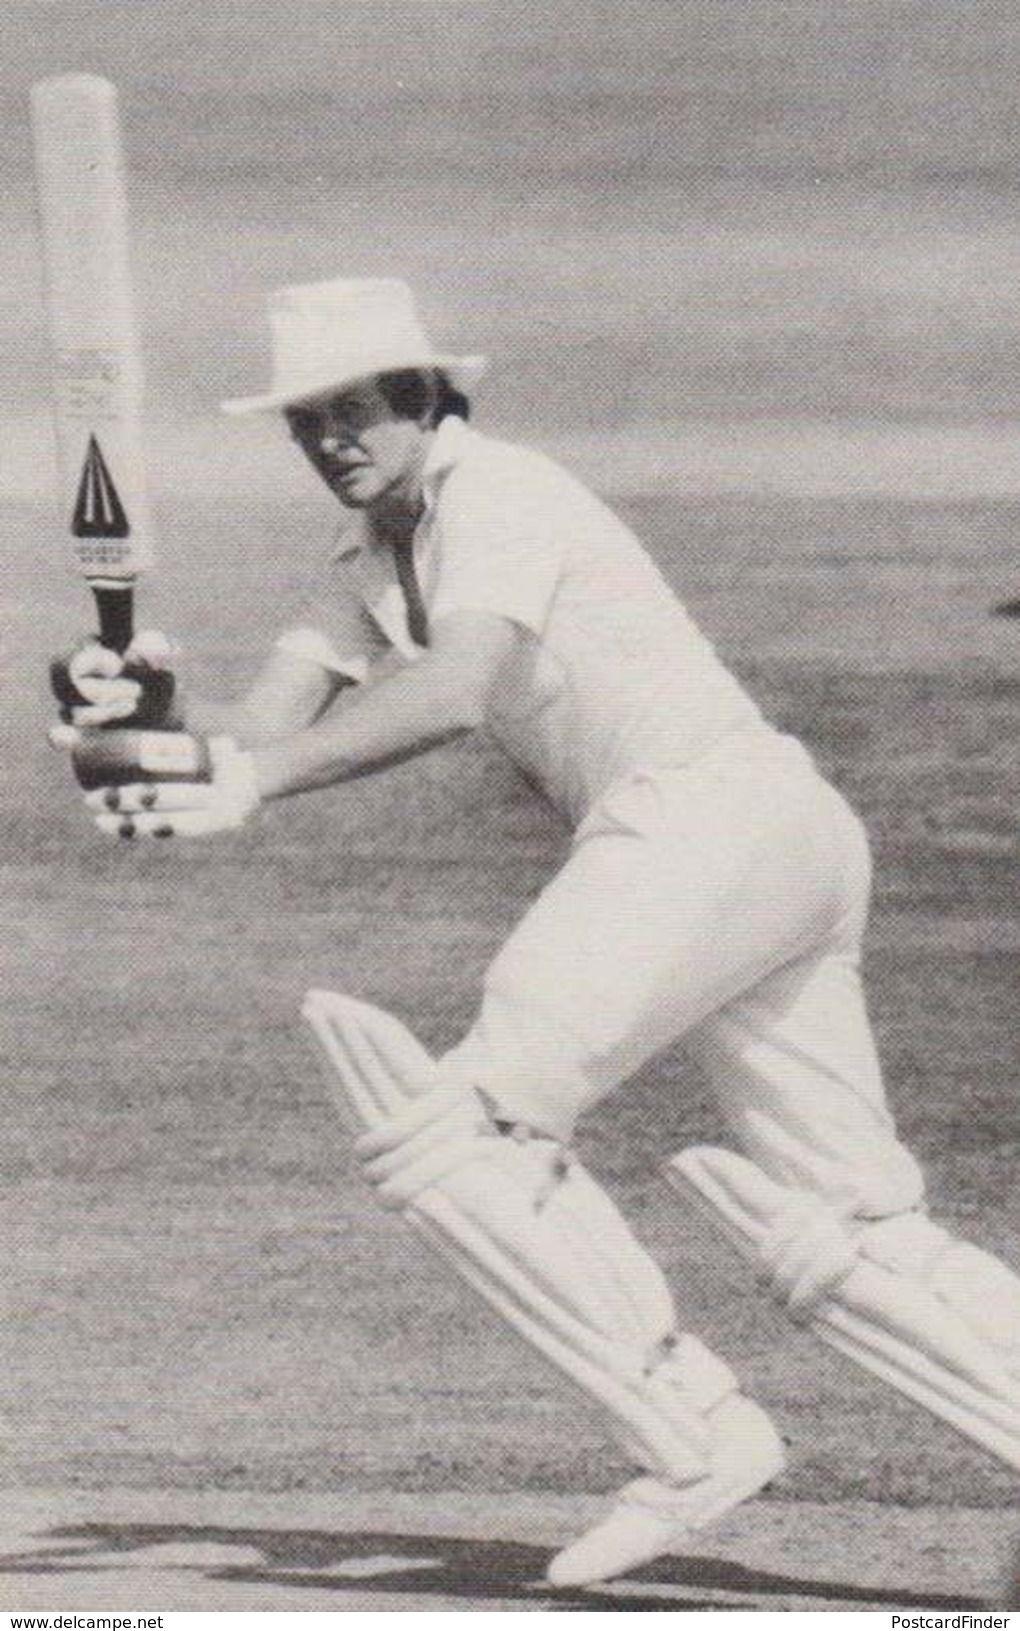 Glenn Maitland Turner Worcester Rare Limited Edition Photo Cricket Postcard Postcards Cricket Cricket Bat Duncan Fearnley